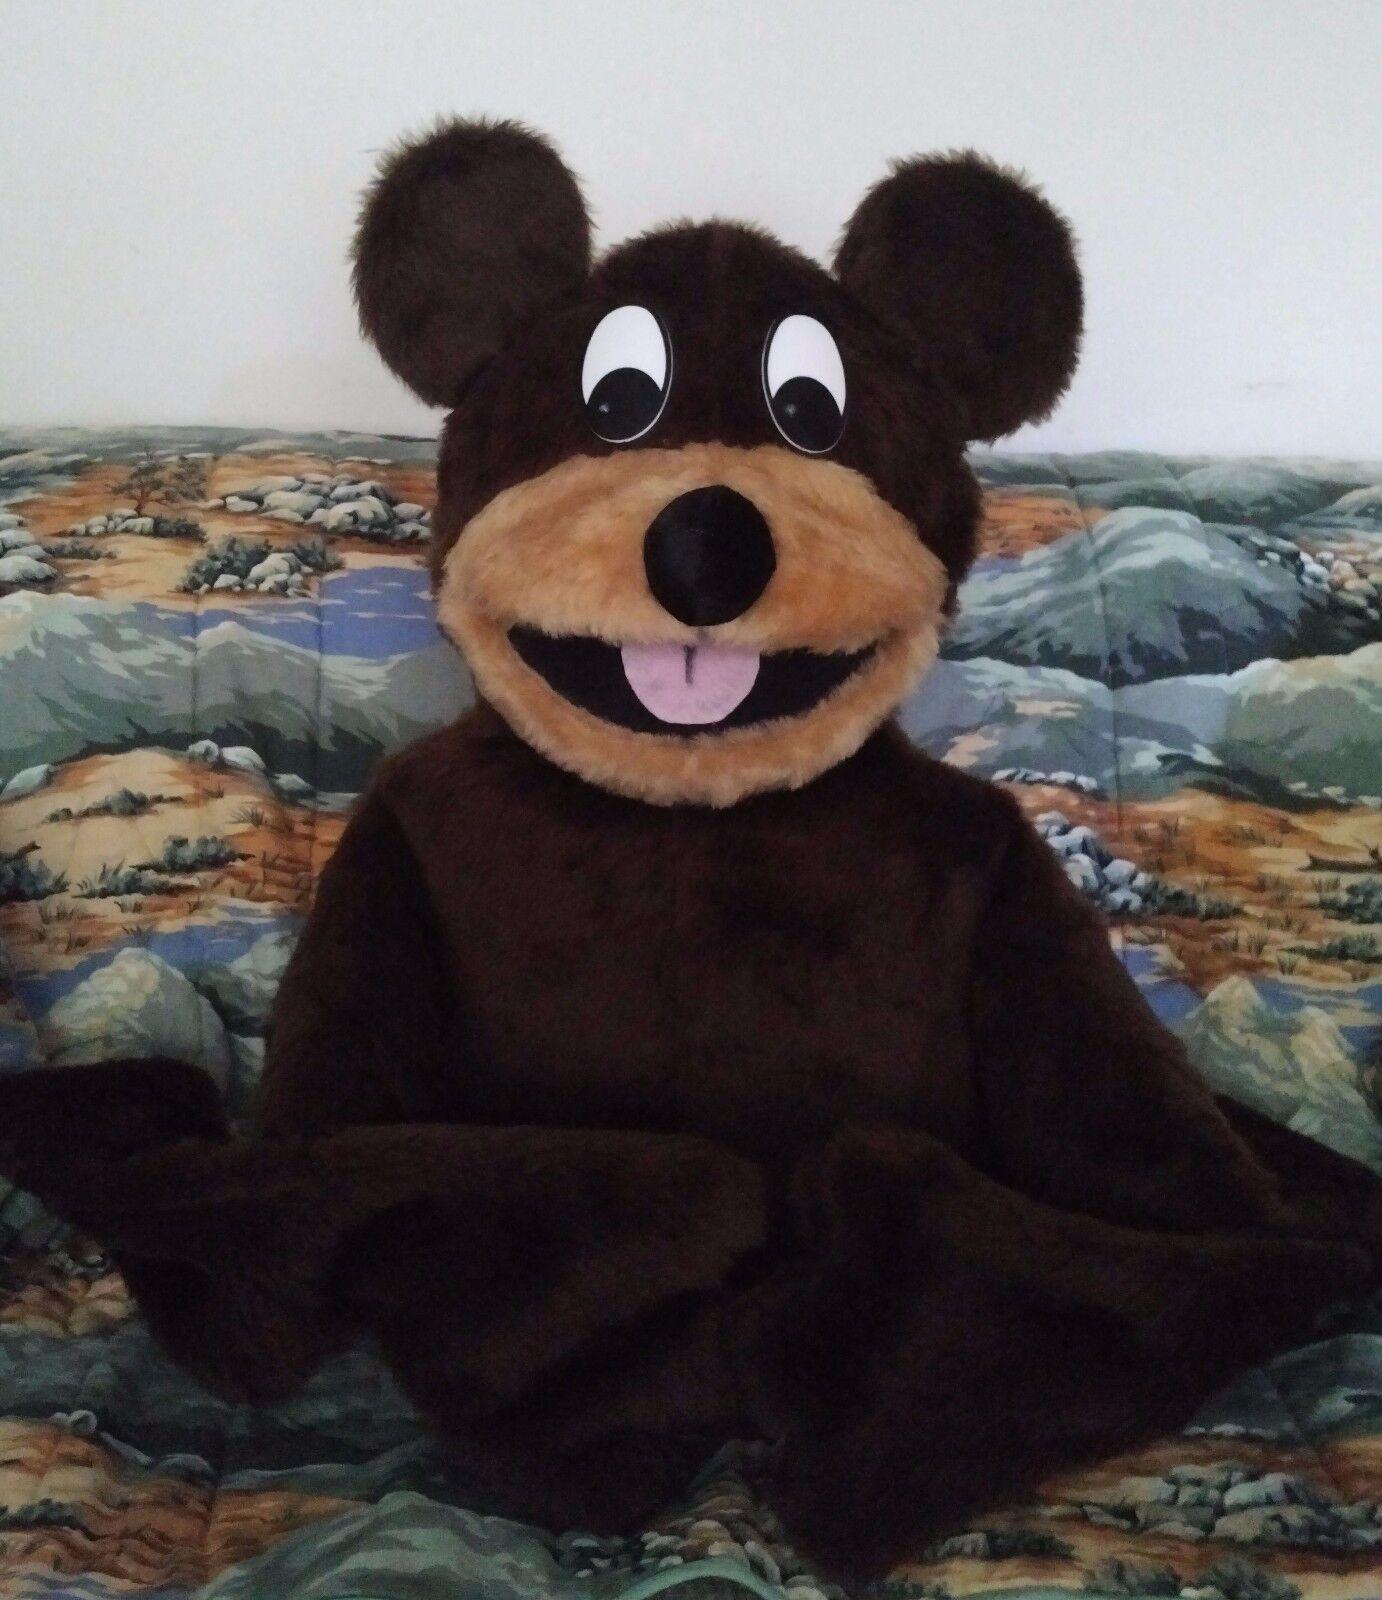 Cartoon Human Arm Bear Puppet for VBS ministry, ventriloquists, teachers,zoology